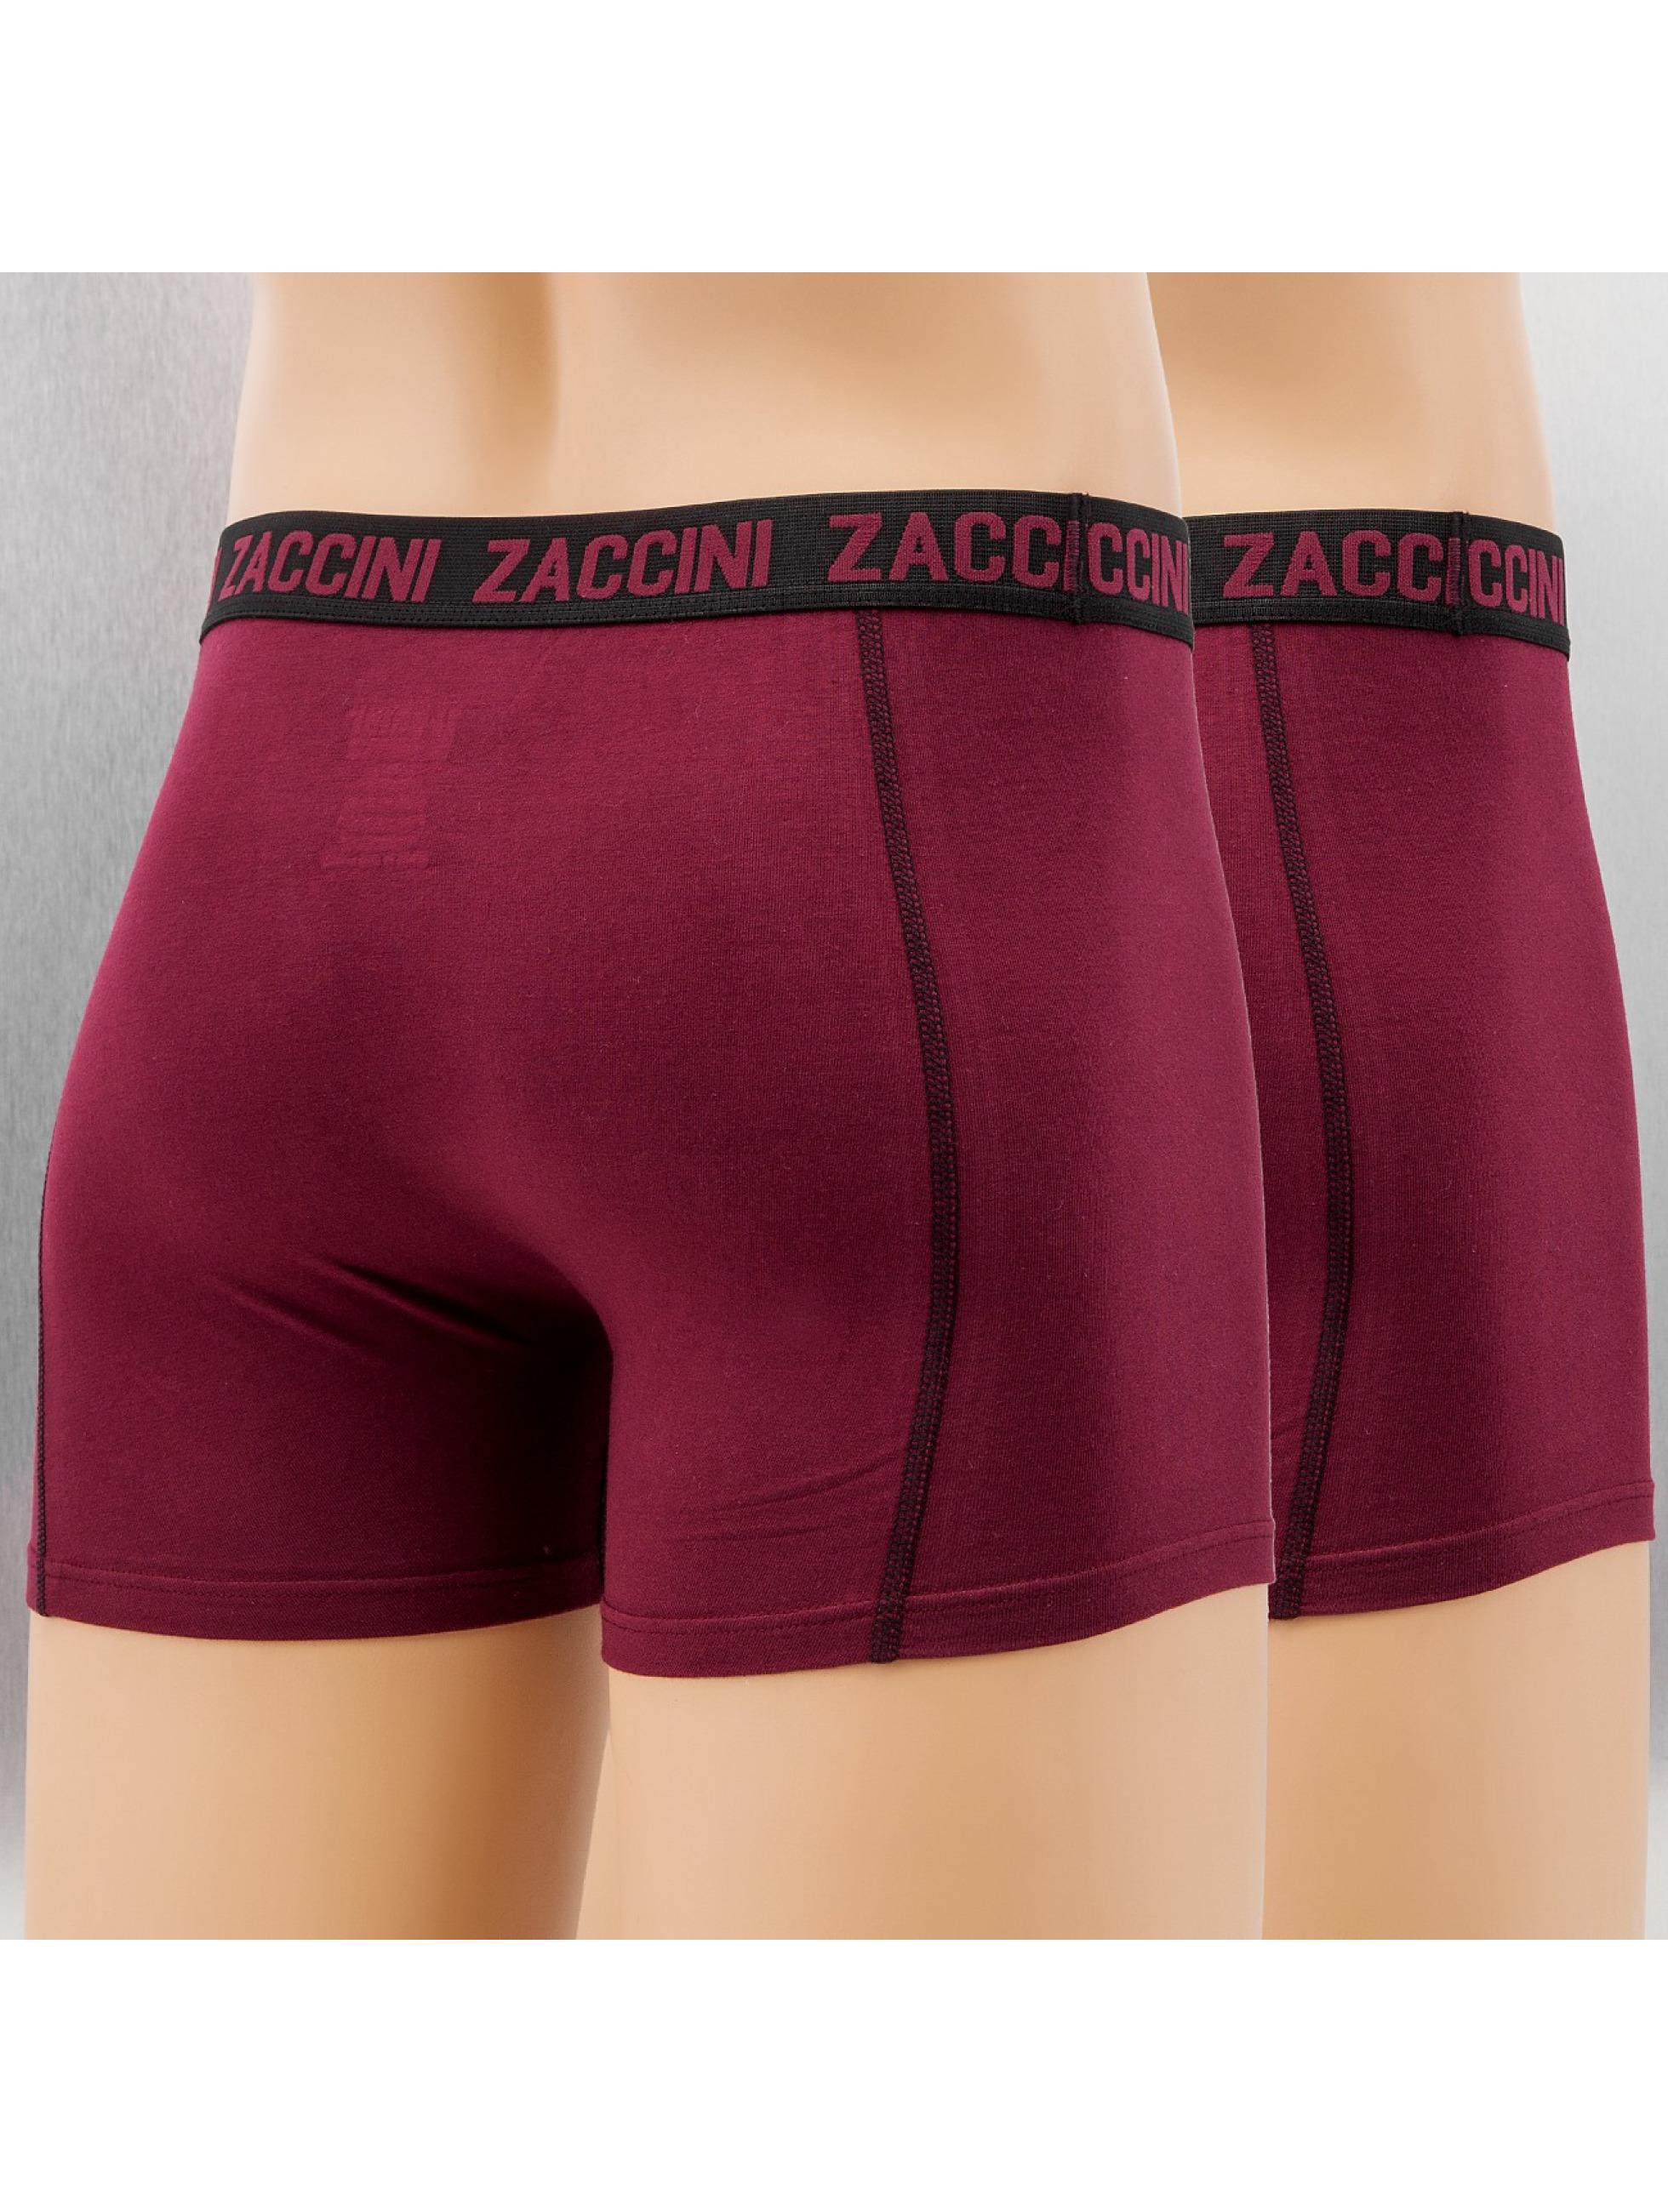 Zaccini Boxershorts Uni 2-Pack rot